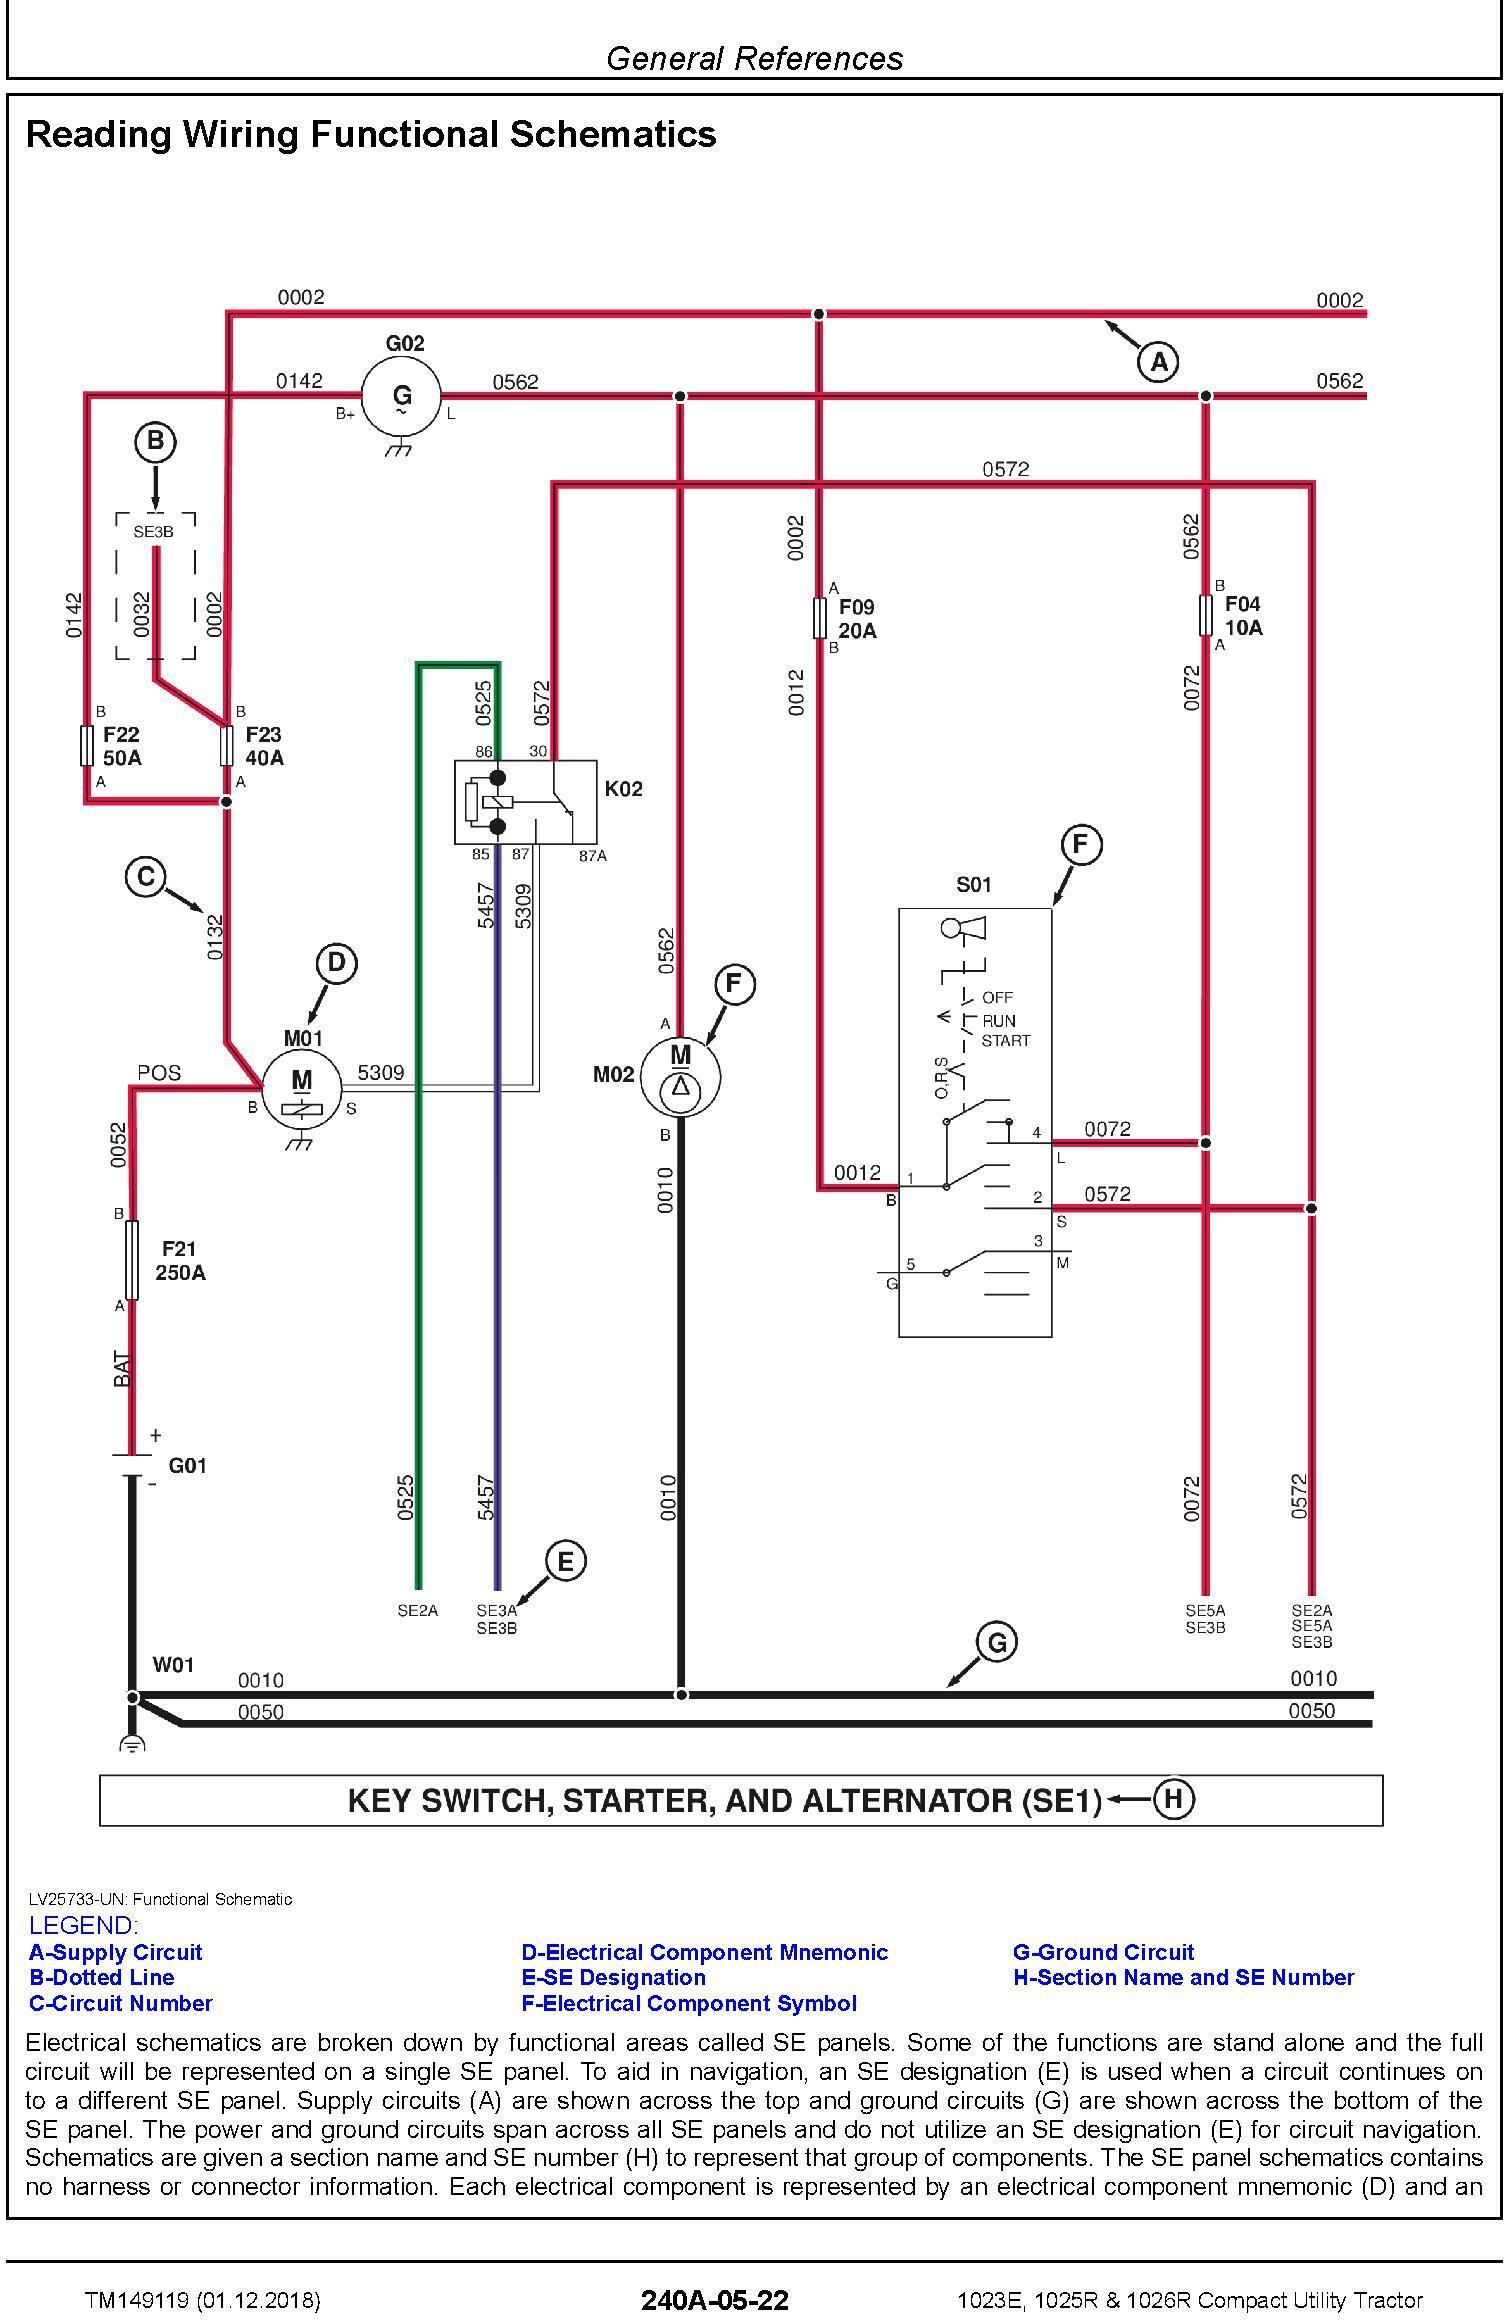 John Deere 1023E, 1025R, 1026R Compact Utility Tractor (SN. HJ0100001- ) Technical Manual (TM149119) - 2